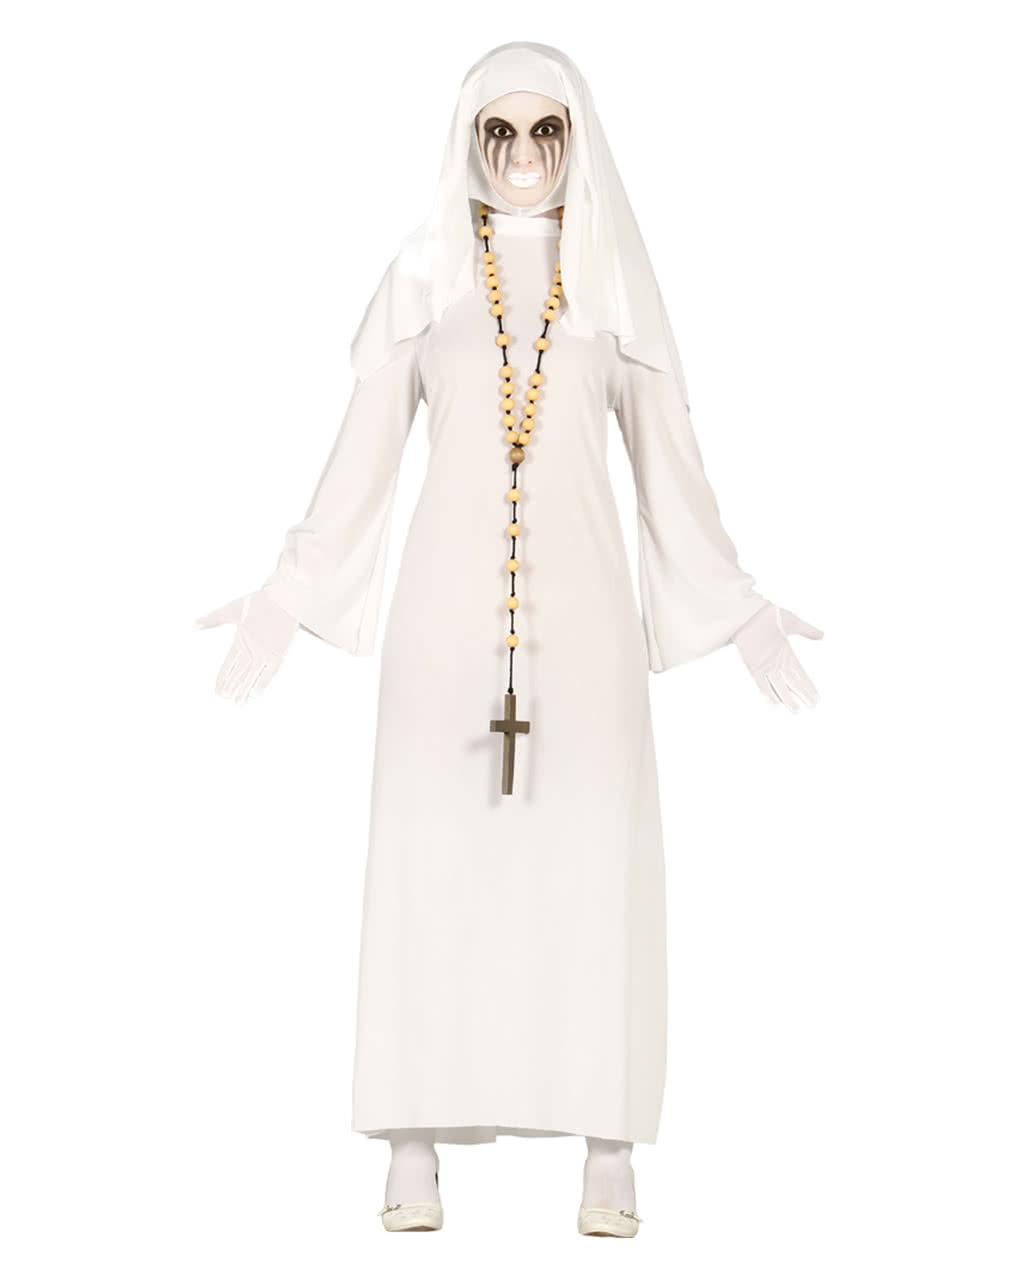 Gespentisches Nonnen Kostum Fur Fasching Halloween Karneval Universe